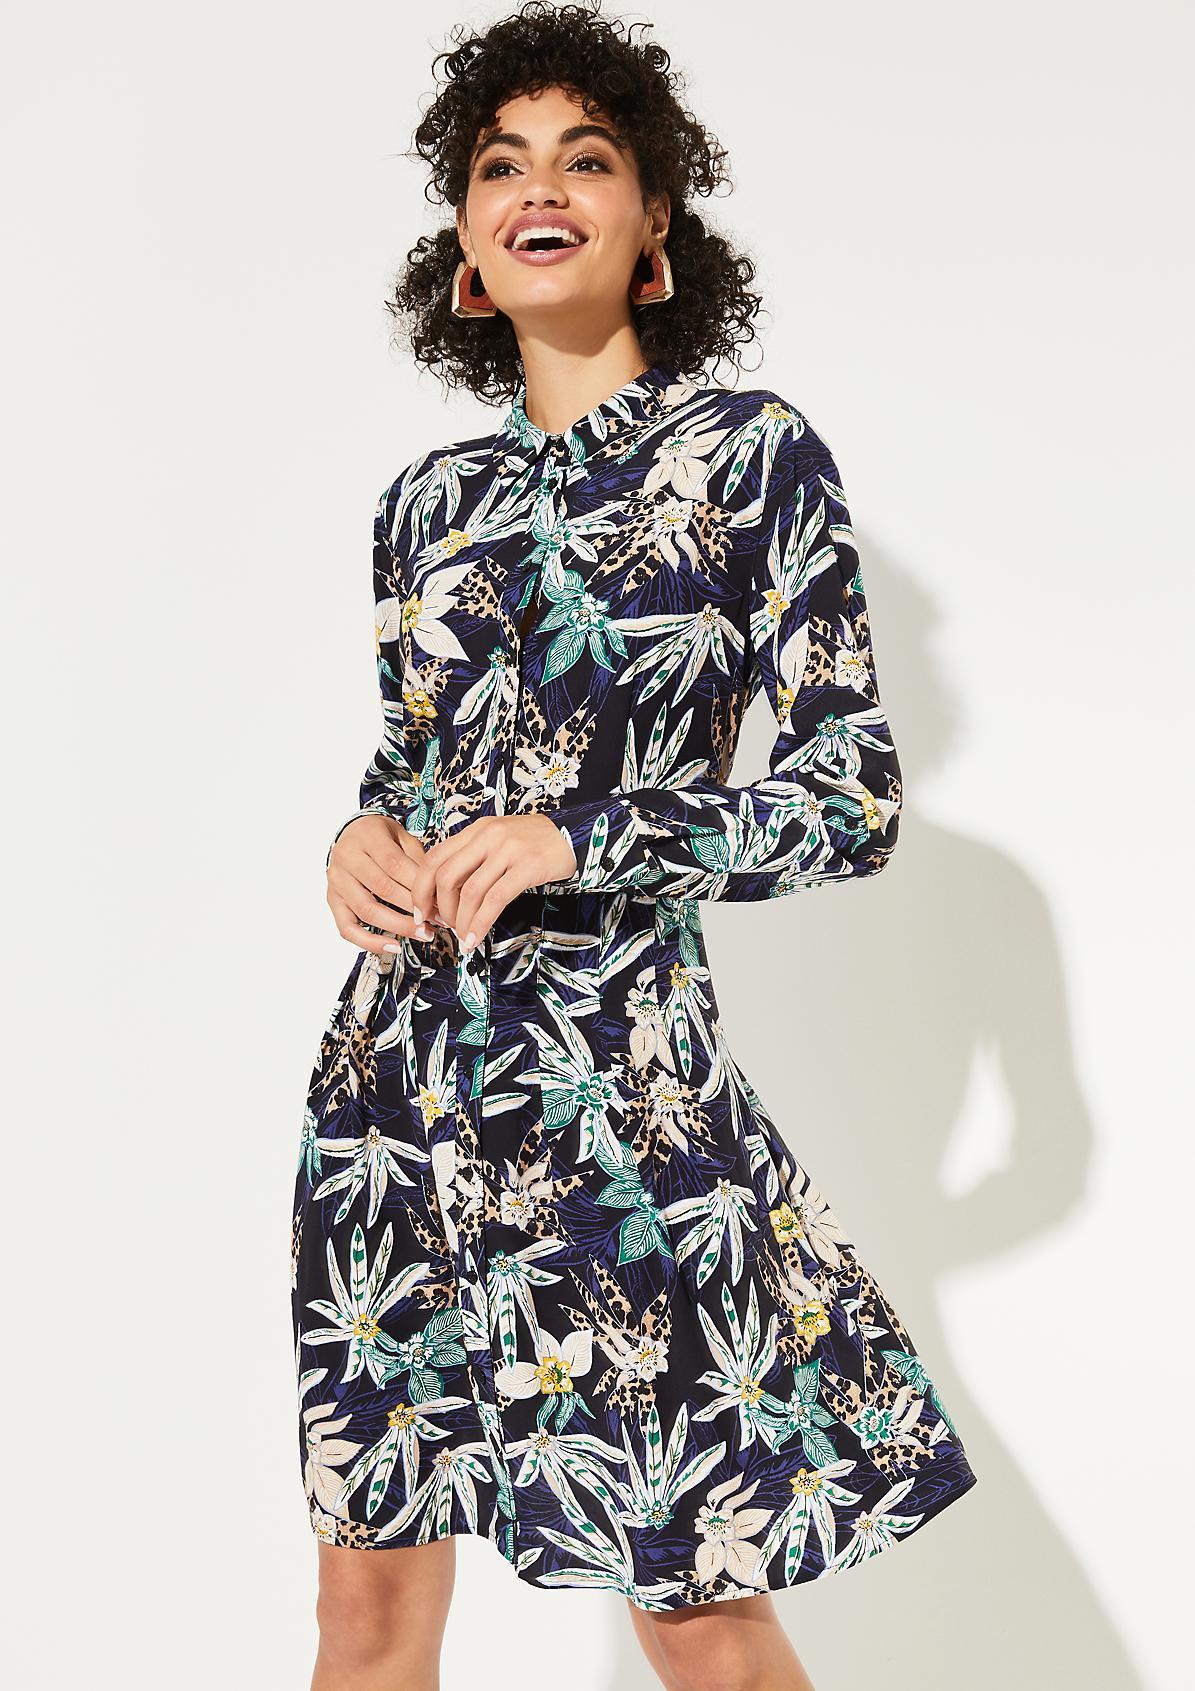 Hemdblusenkleid aus Krepp mit buntem Floralmuster